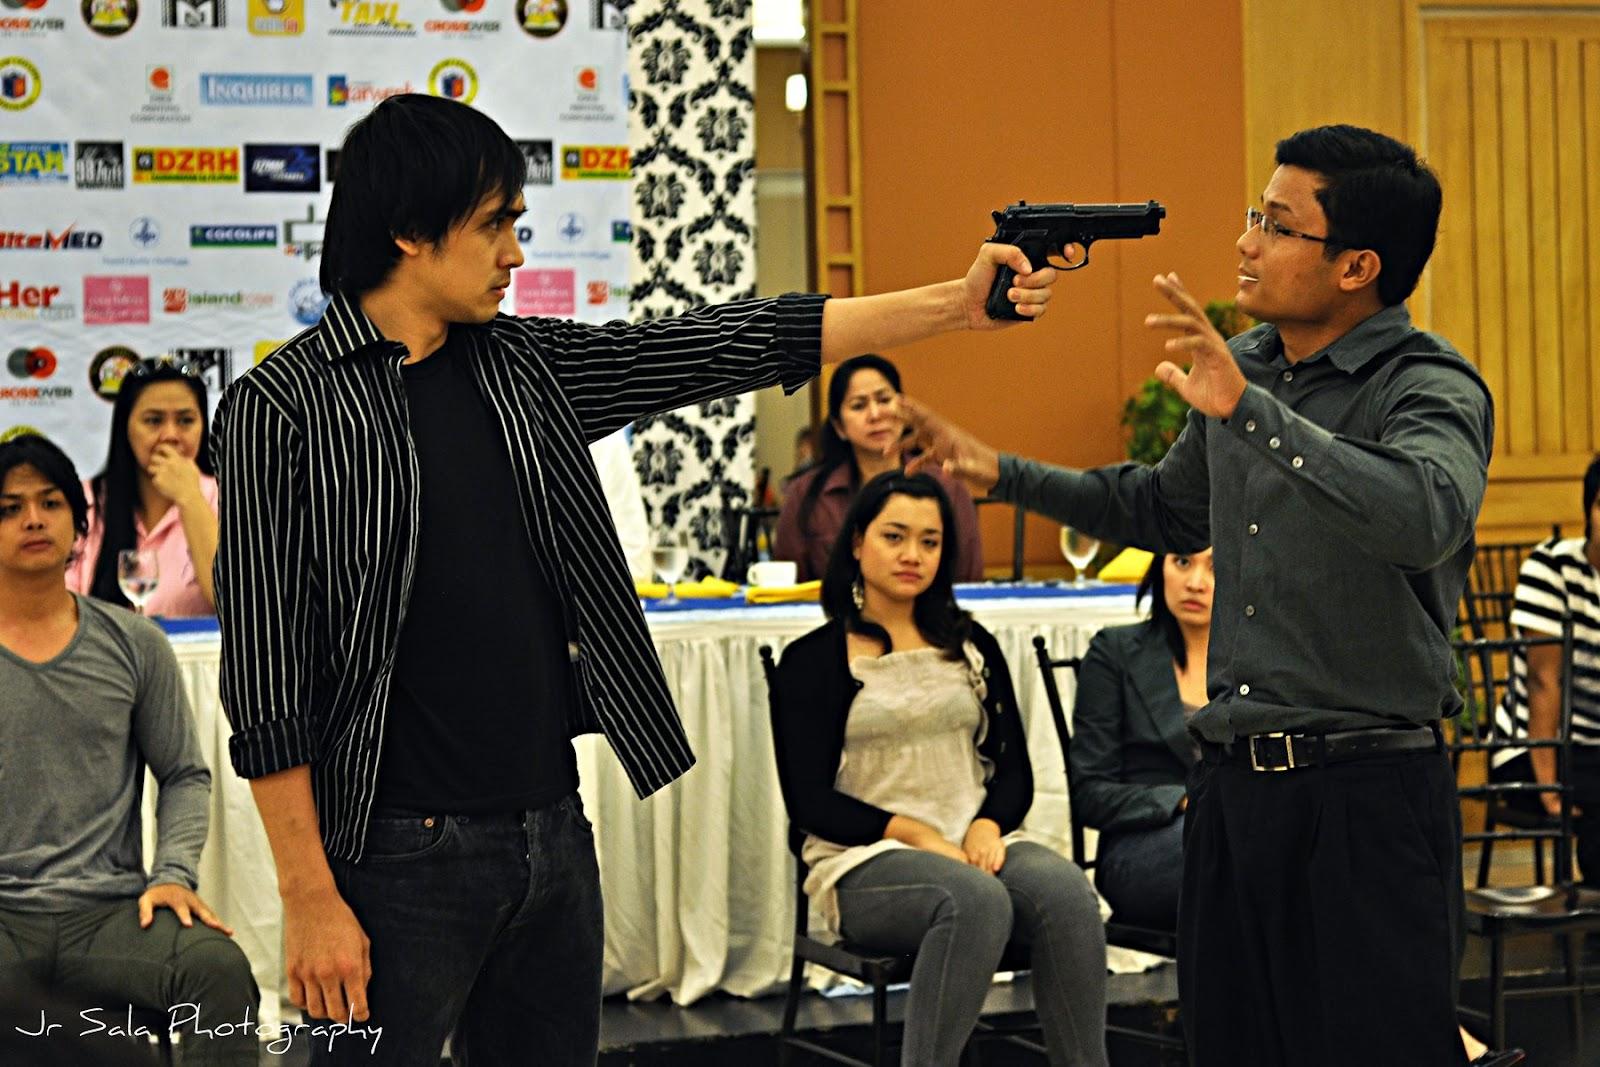 Tanghalang Pilipino's Political Play WALANG KUKURAP Opens Tonight, 9/14